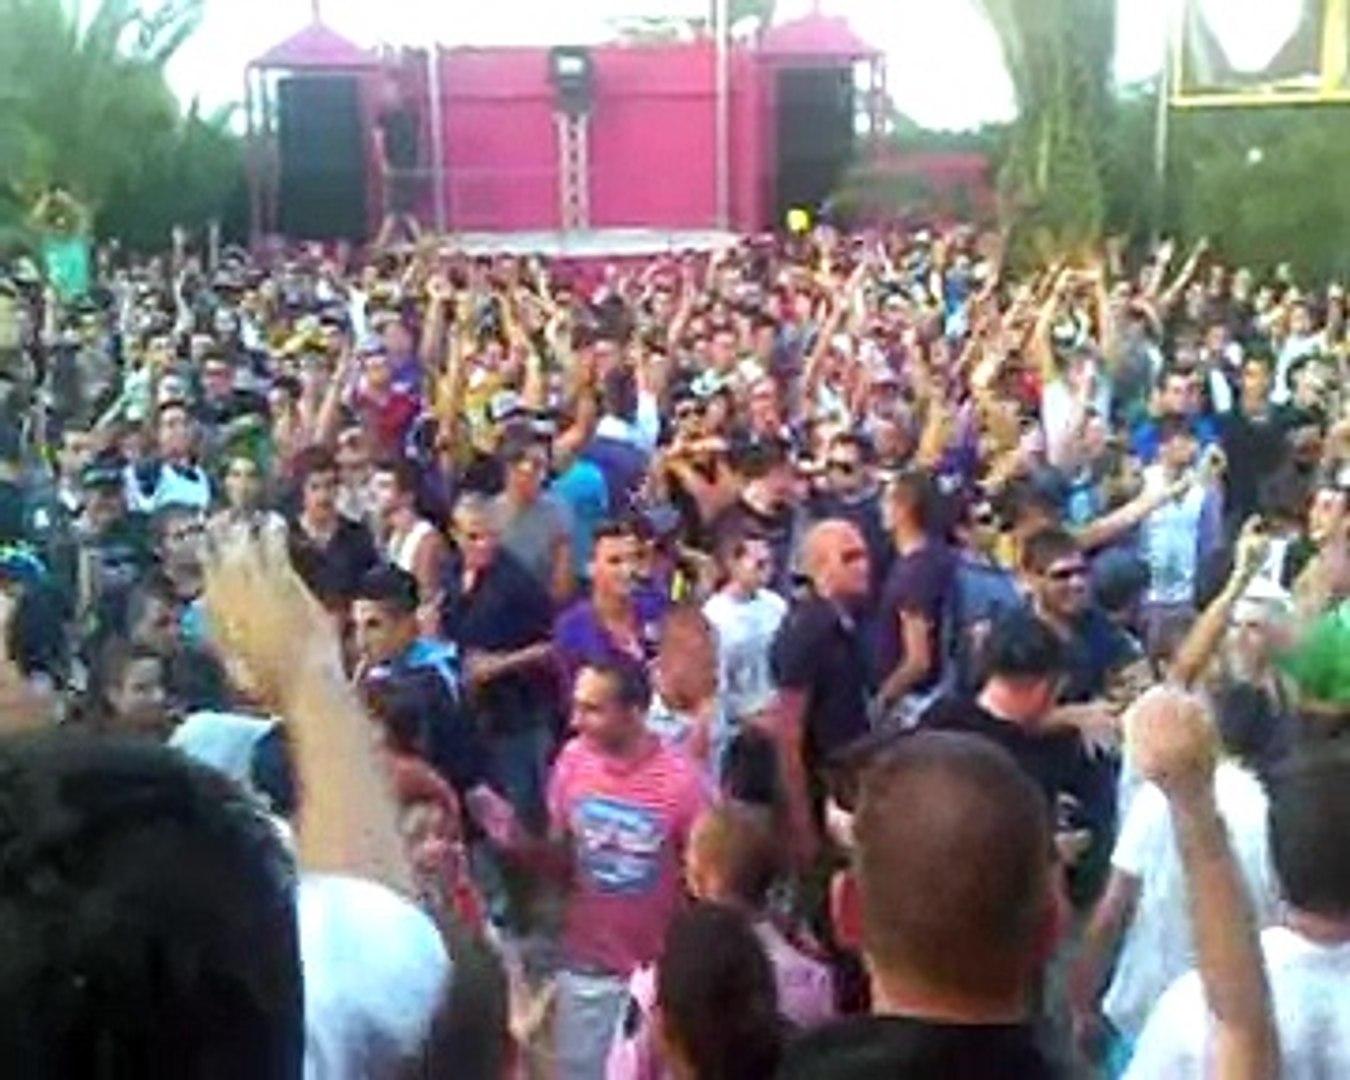 ALBA LUCA AGNELLI Discoteca GUENDALINA 22 agosto 2009 - video dailymotion